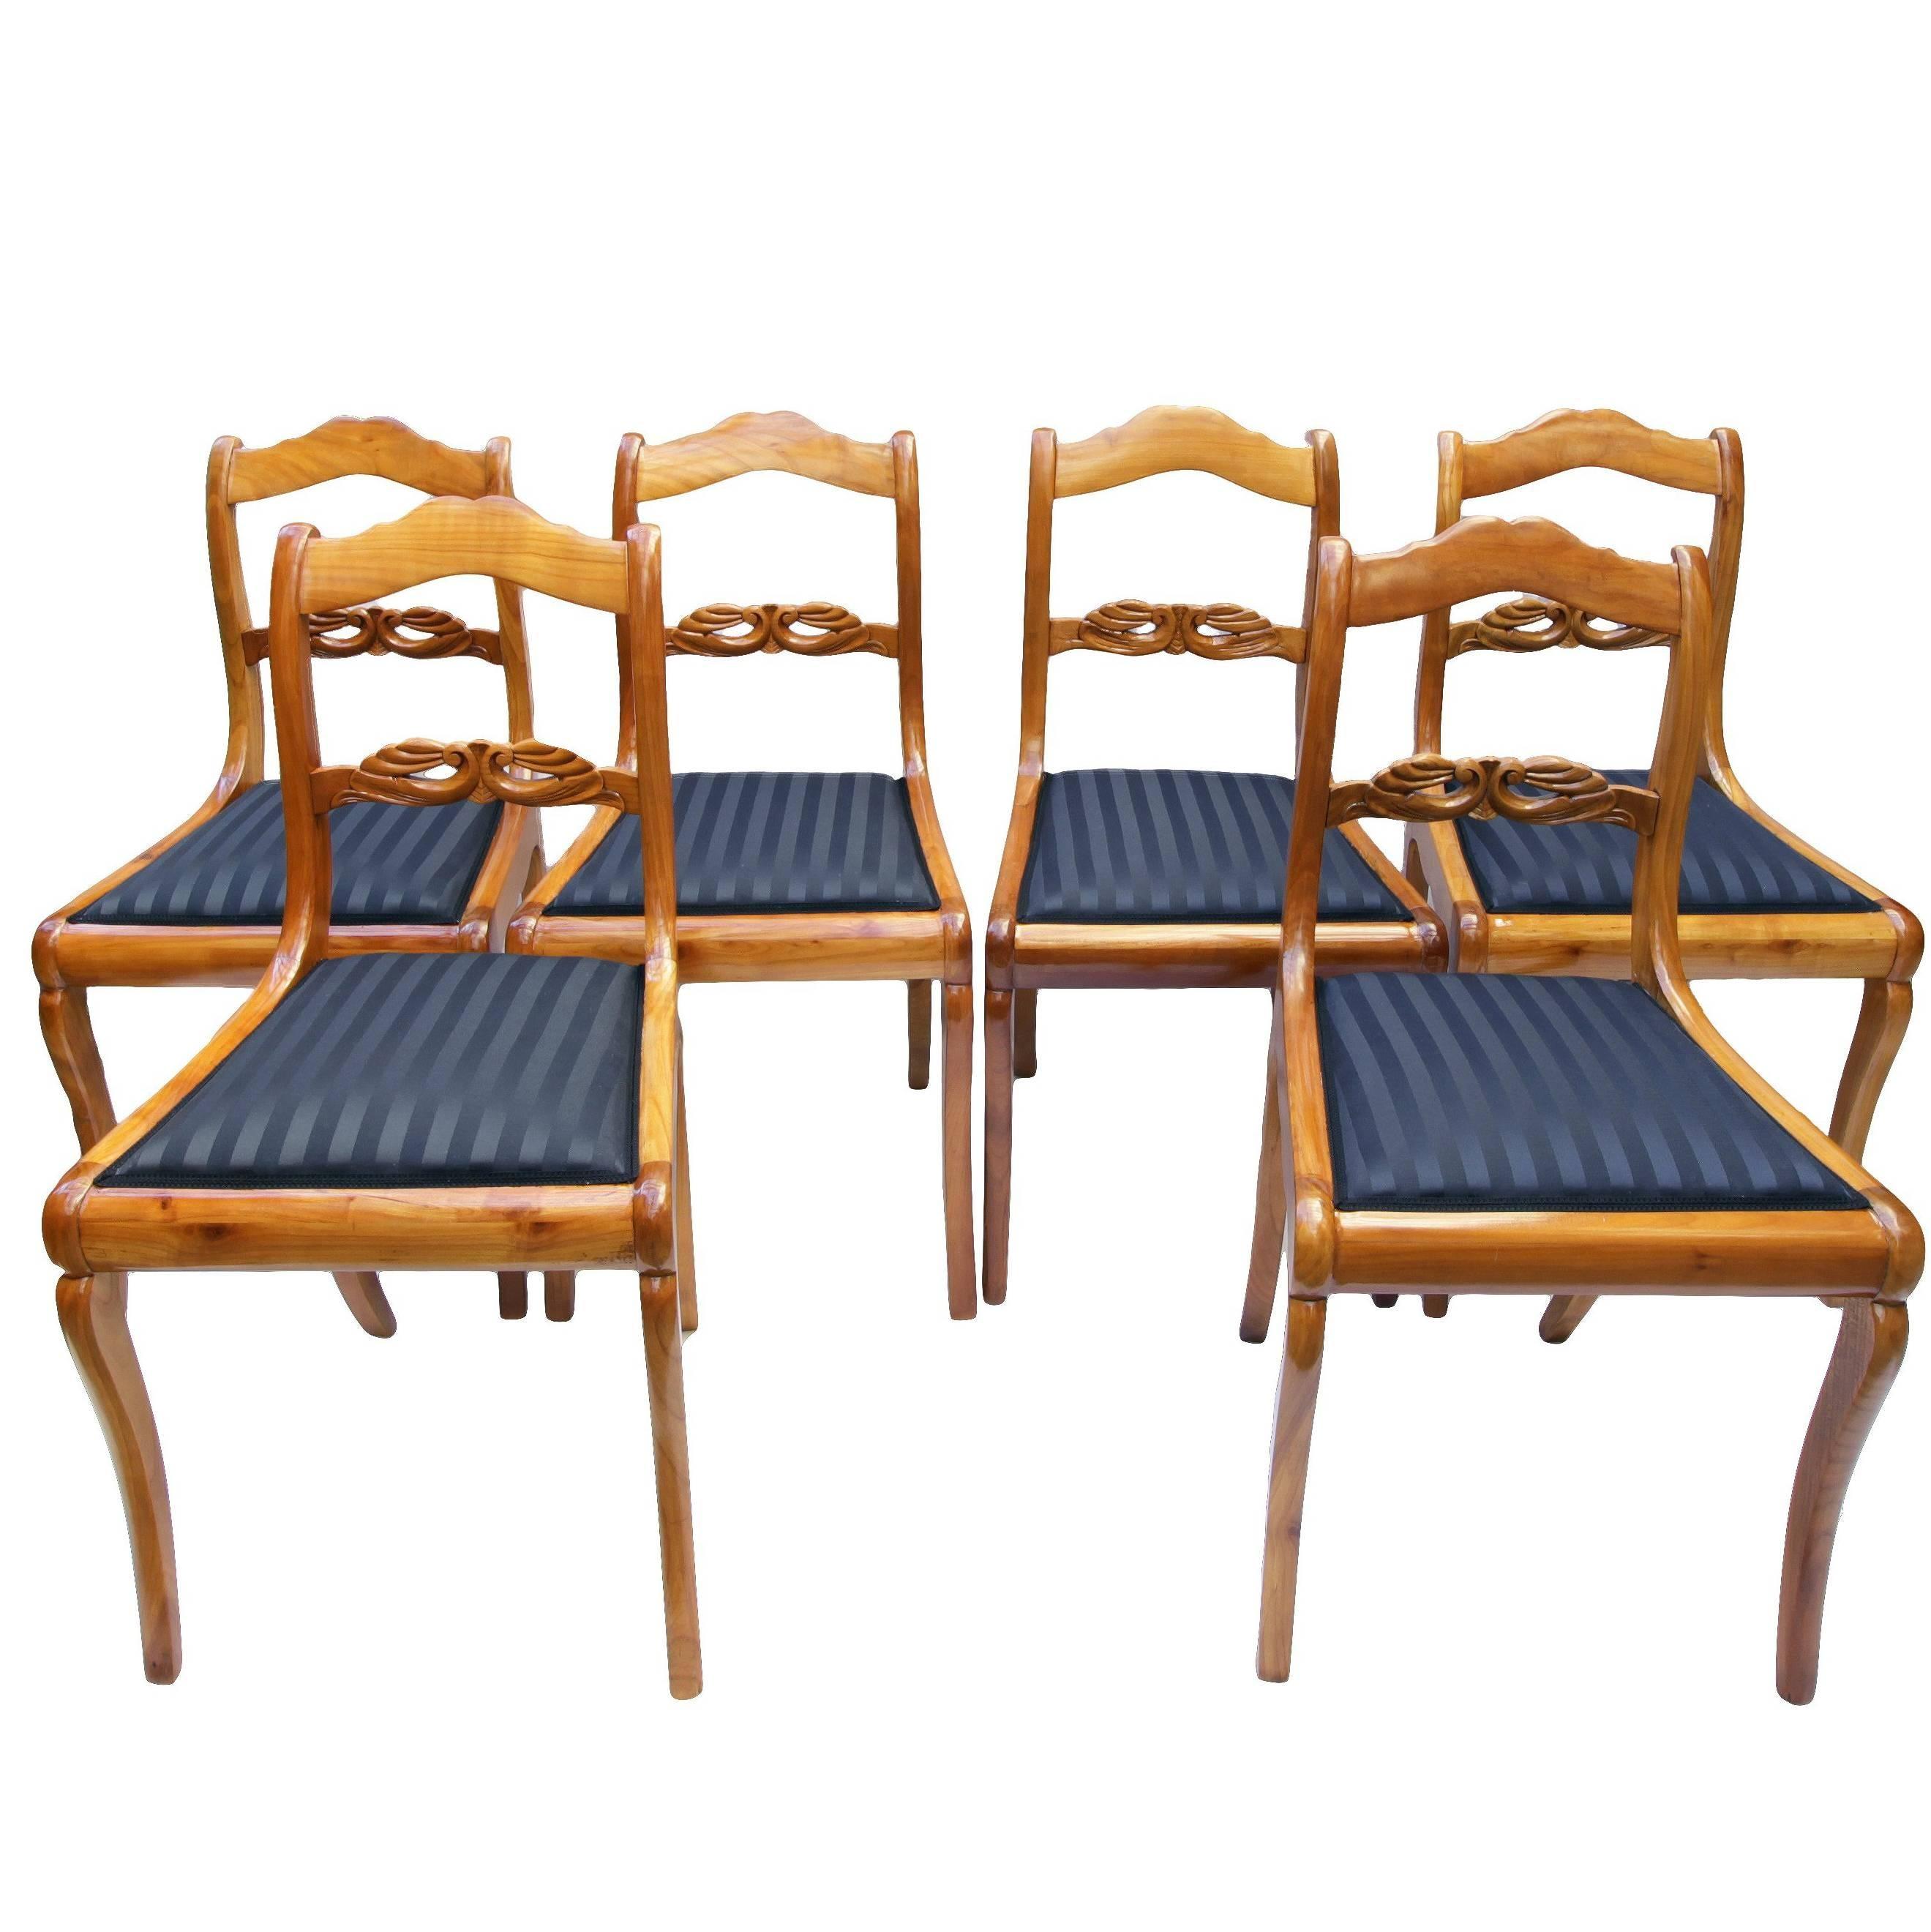 19th Century, Set Of Six Biedermeier Chairs, Germany 1